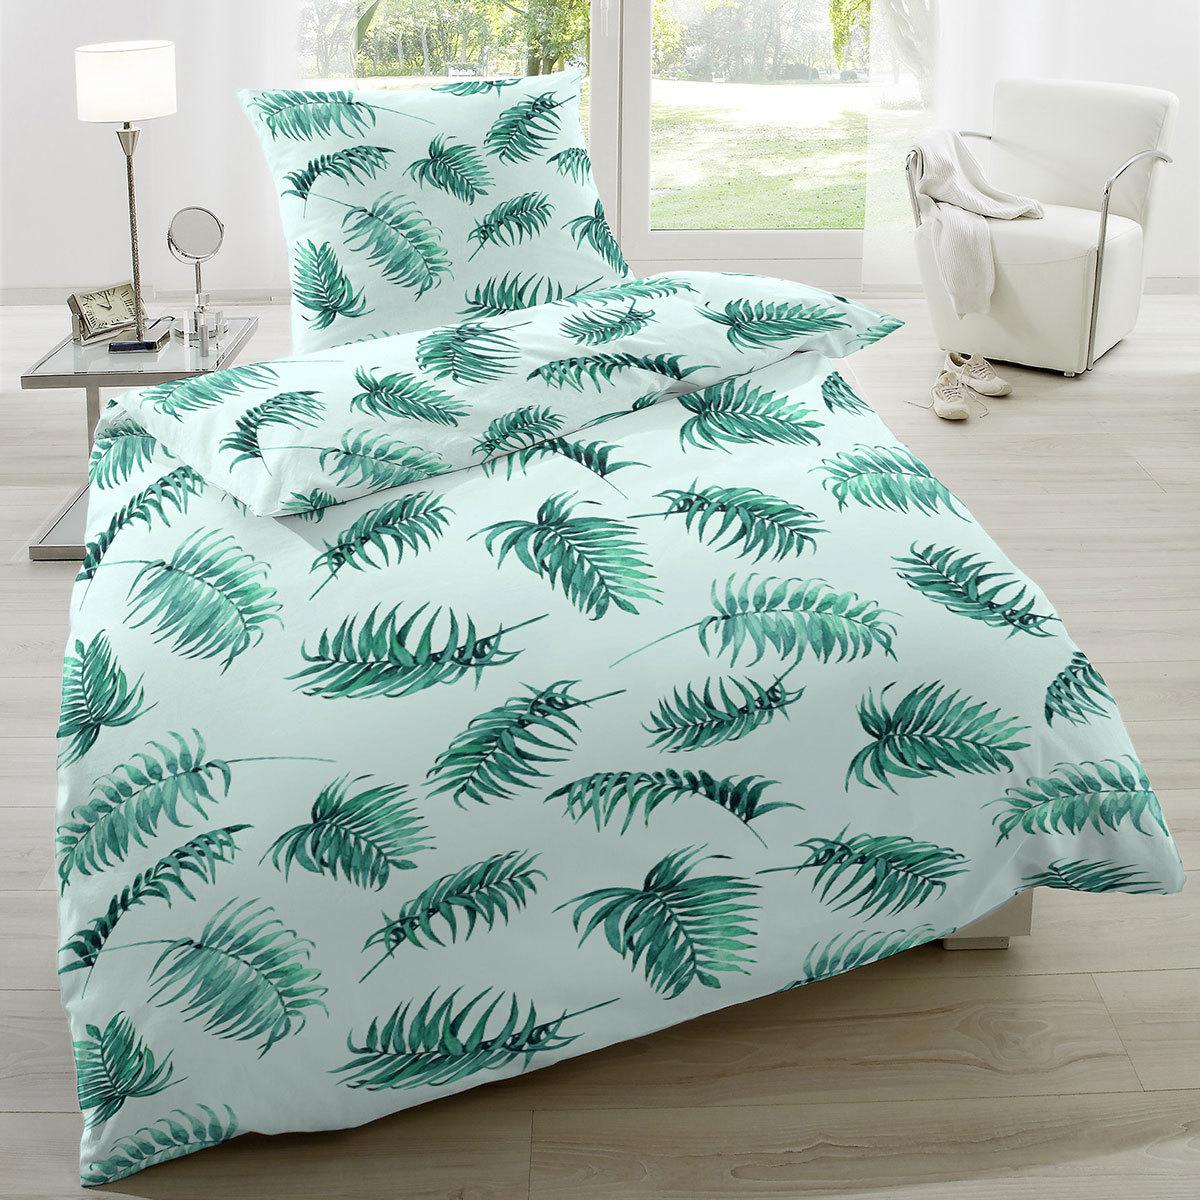 Enrico Coss Baumwoll-Seersucker Bettwäsche Palmblätter grün